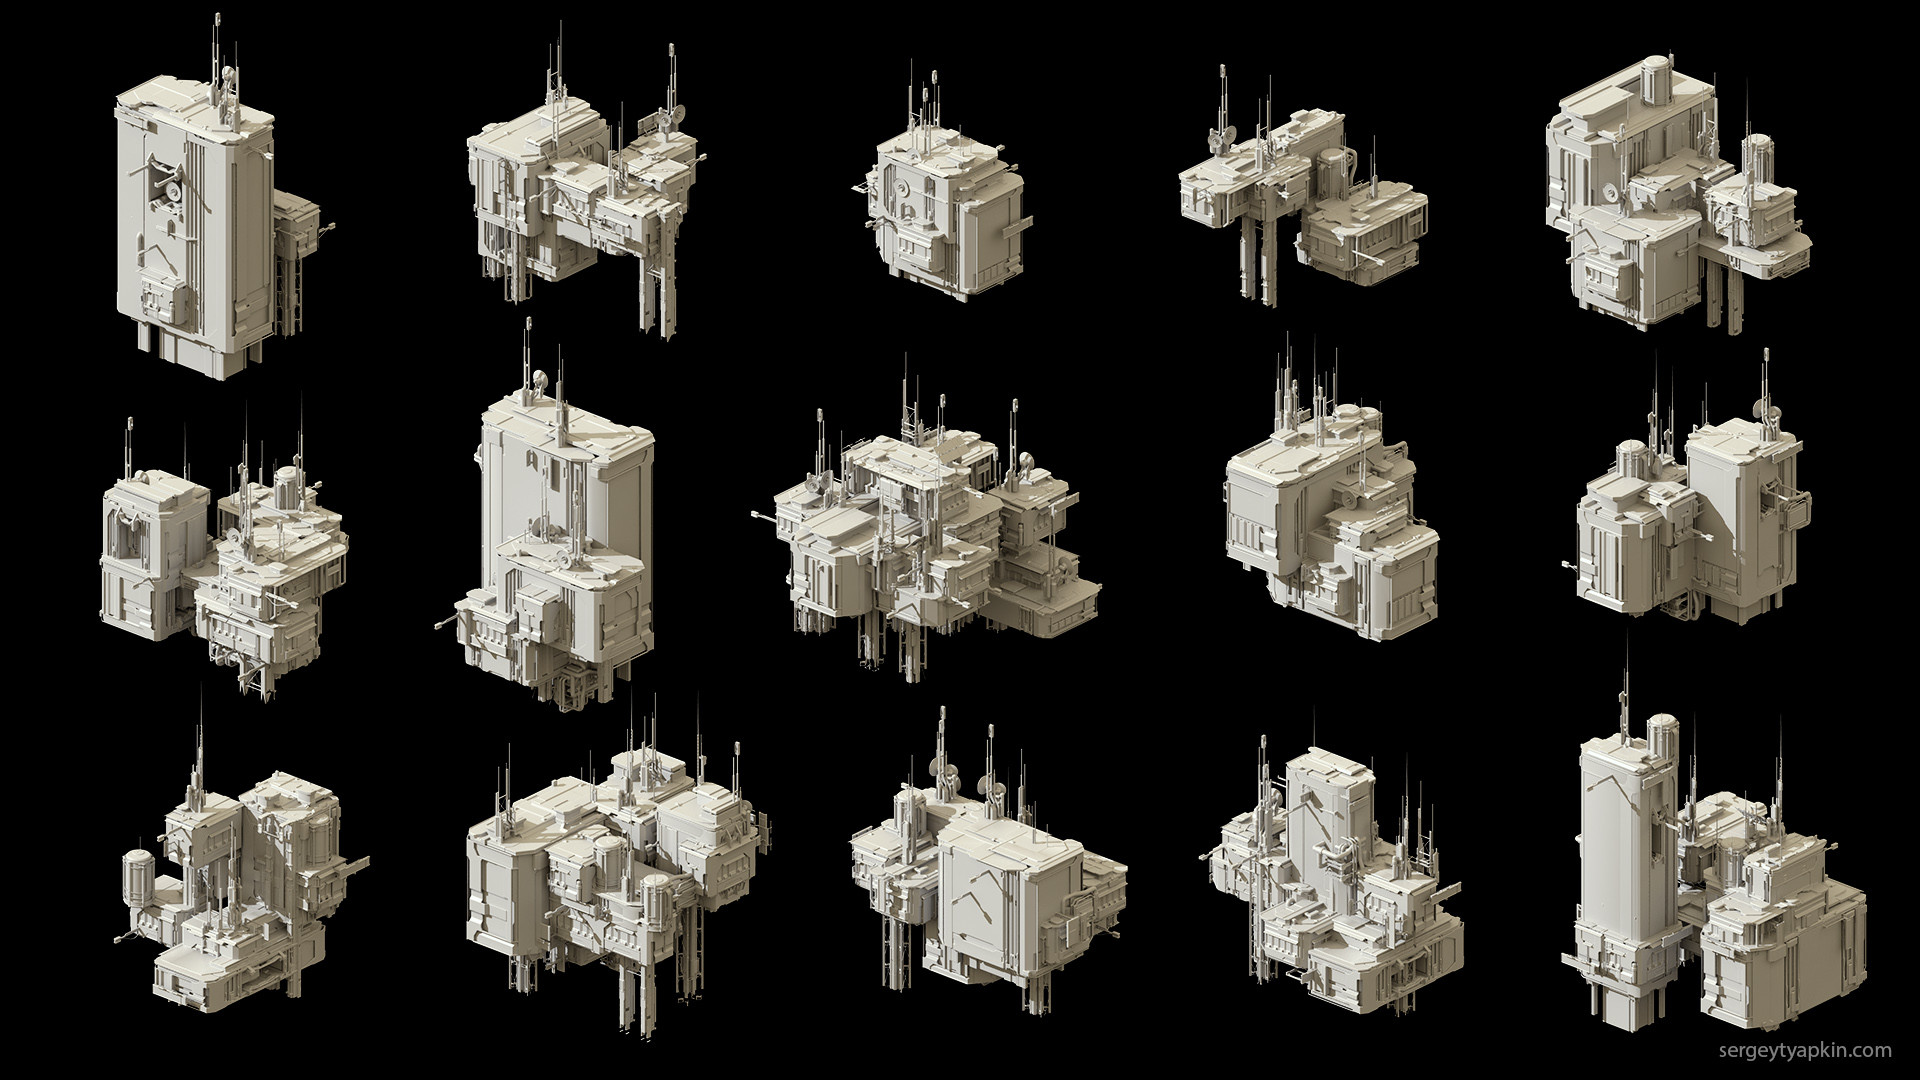 Sergey tyapkin buildings render 2